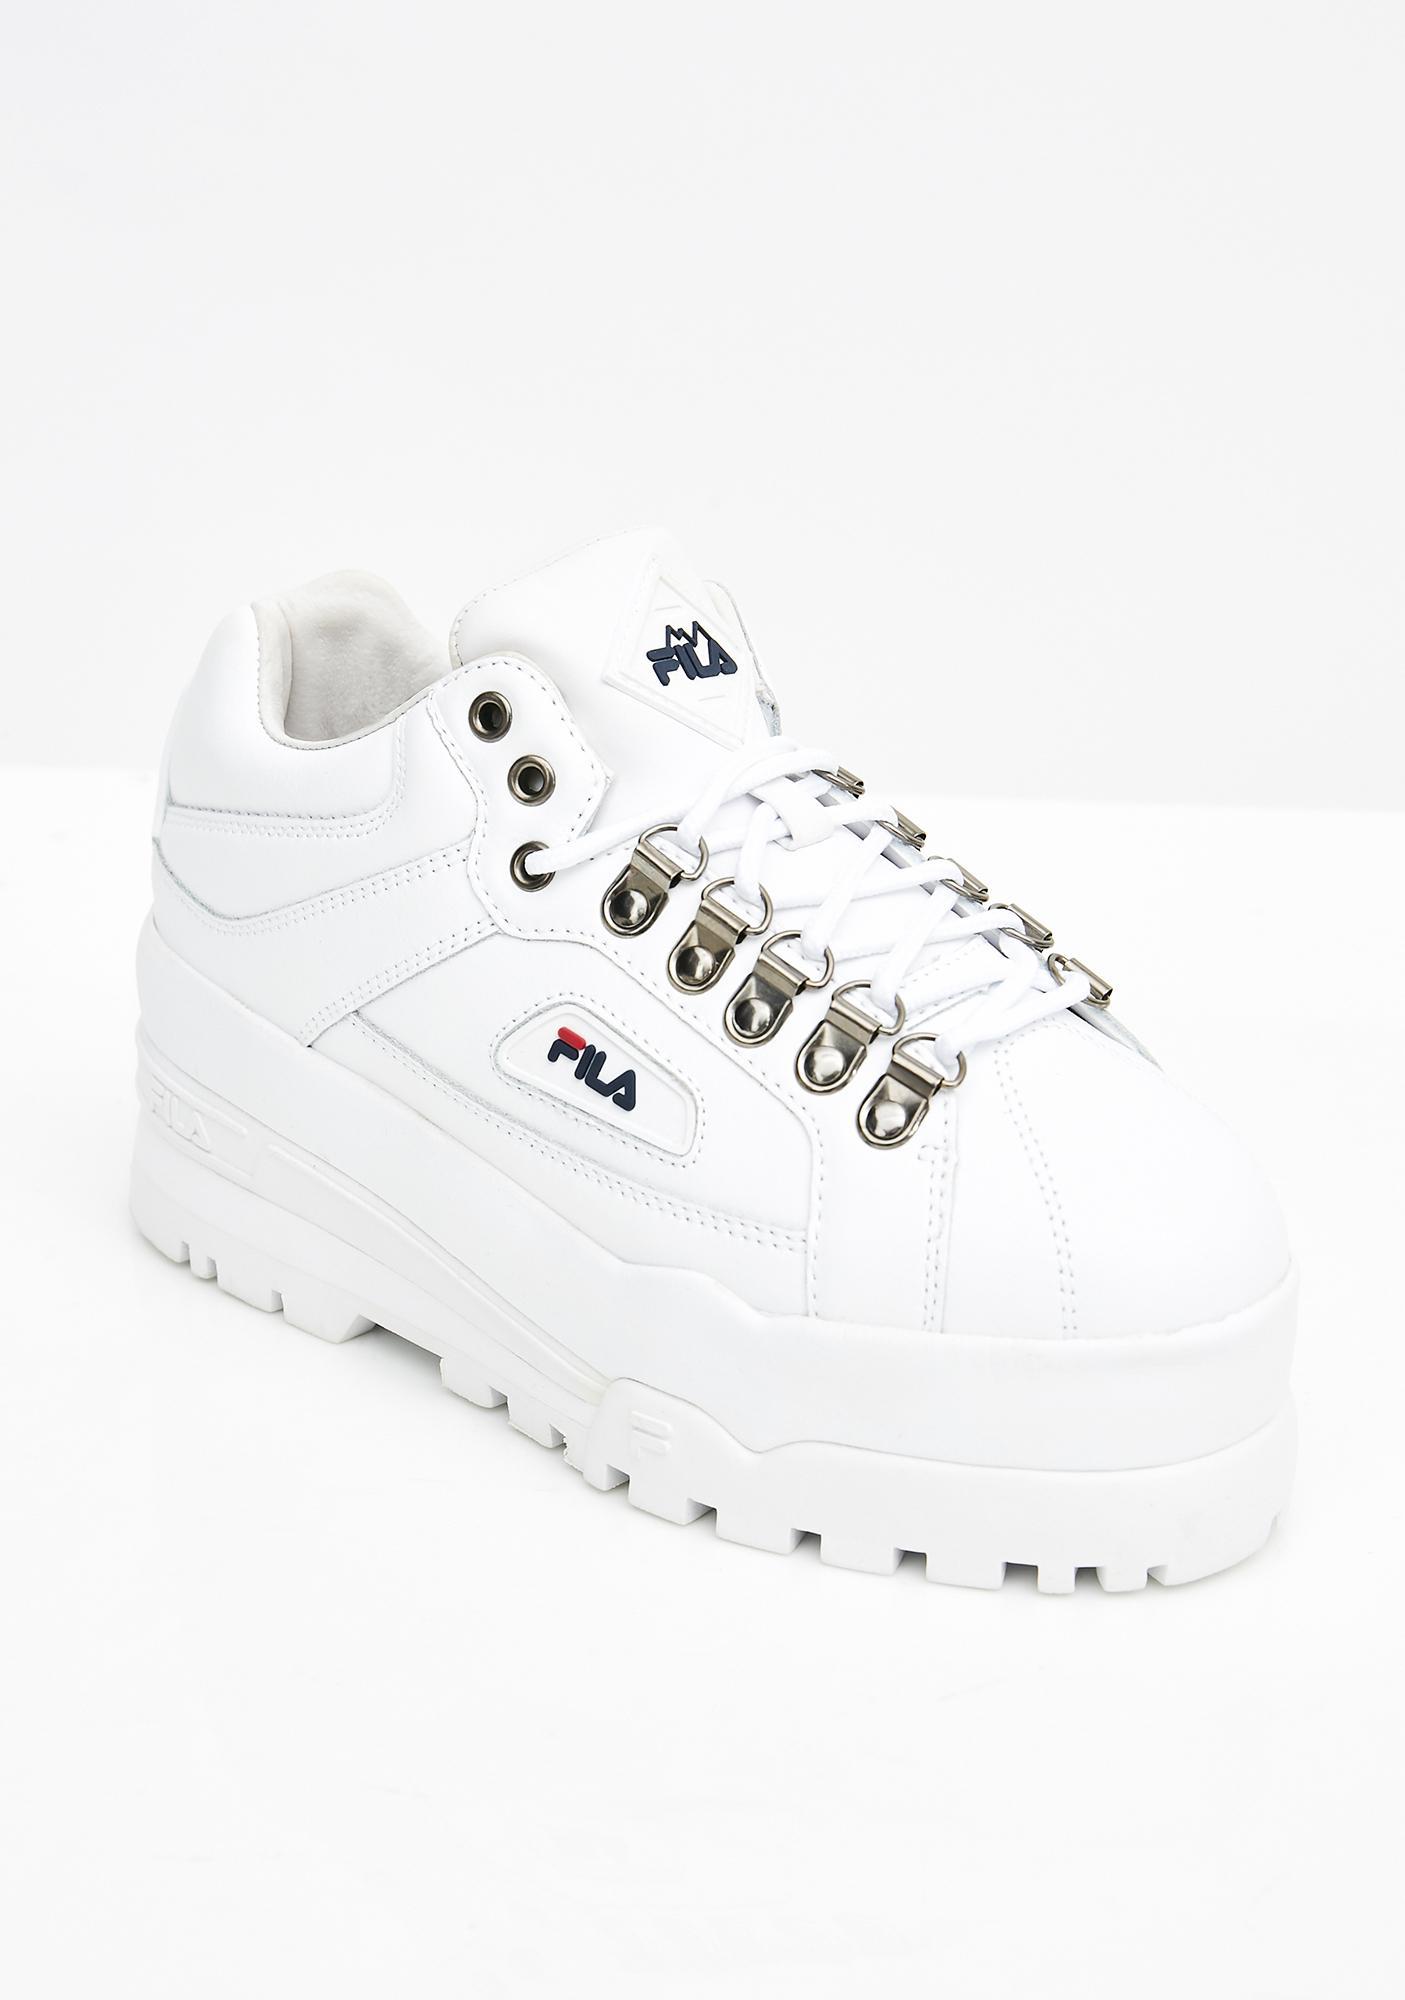 19f55967215f Fila Icy Trailblazer Wedge Sneakers · Fila Icy Trailblazer Wedge Sneakers  ...